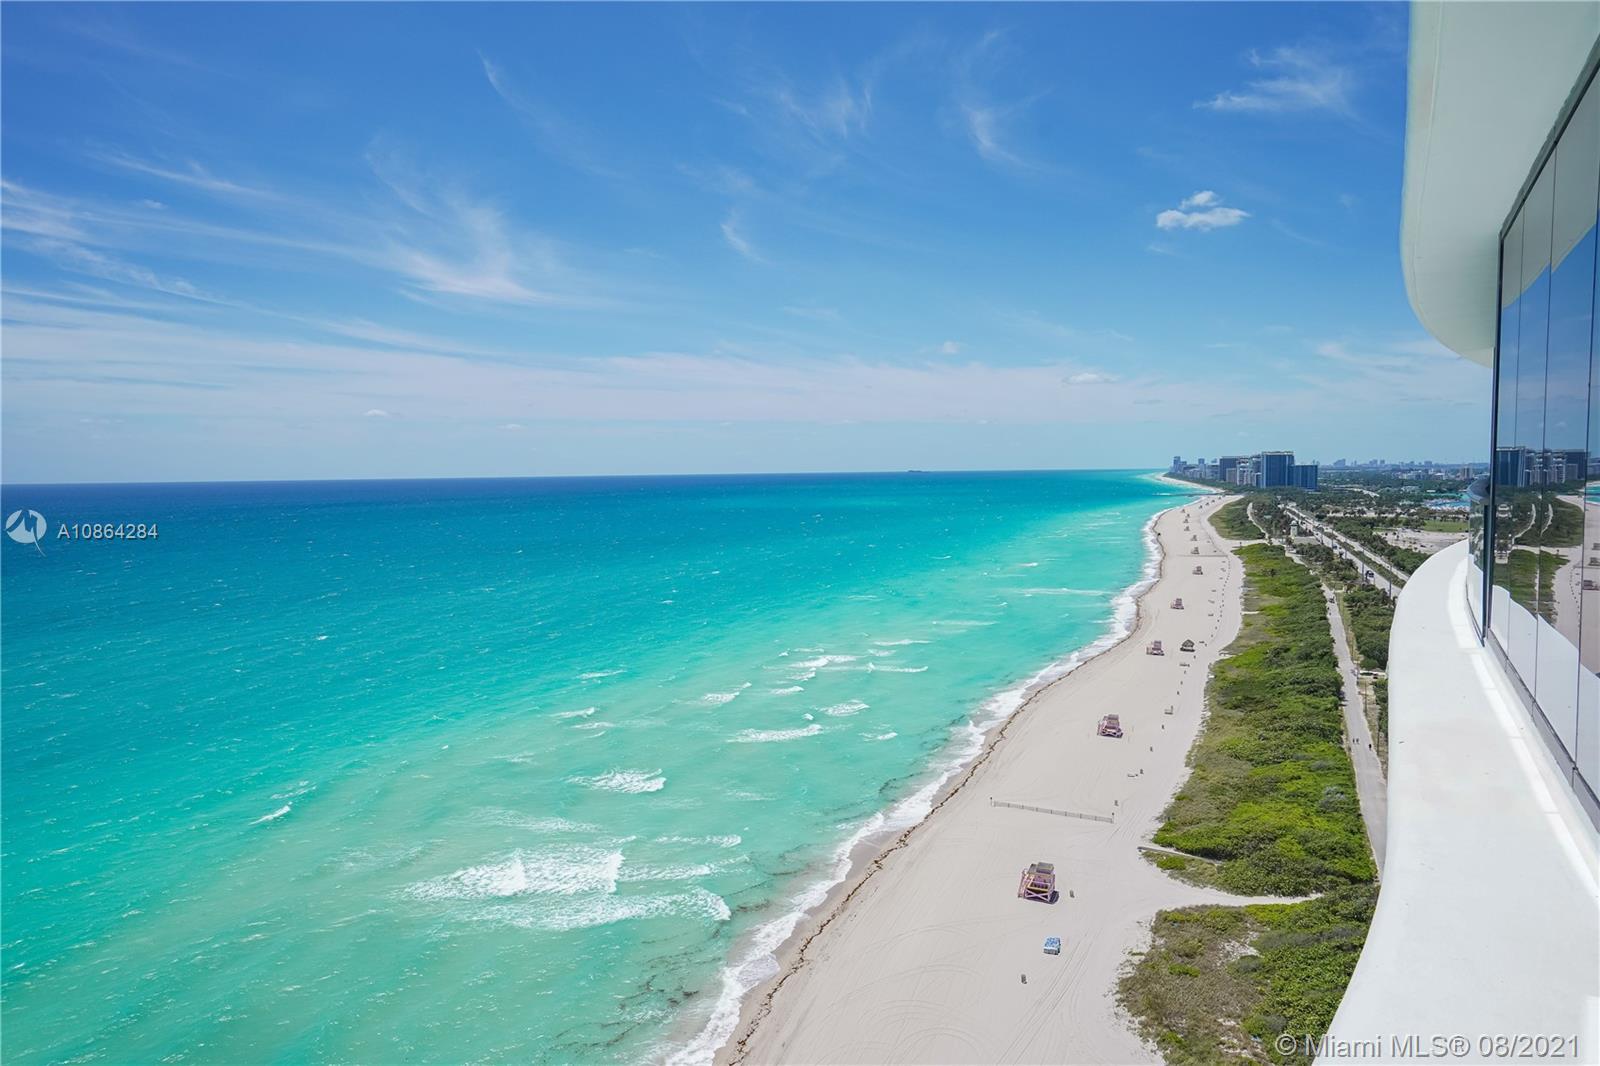 Ritz Carlton Residences #2203 - 15701 Collins #2203, Sunny Isles Beach, FL 33160